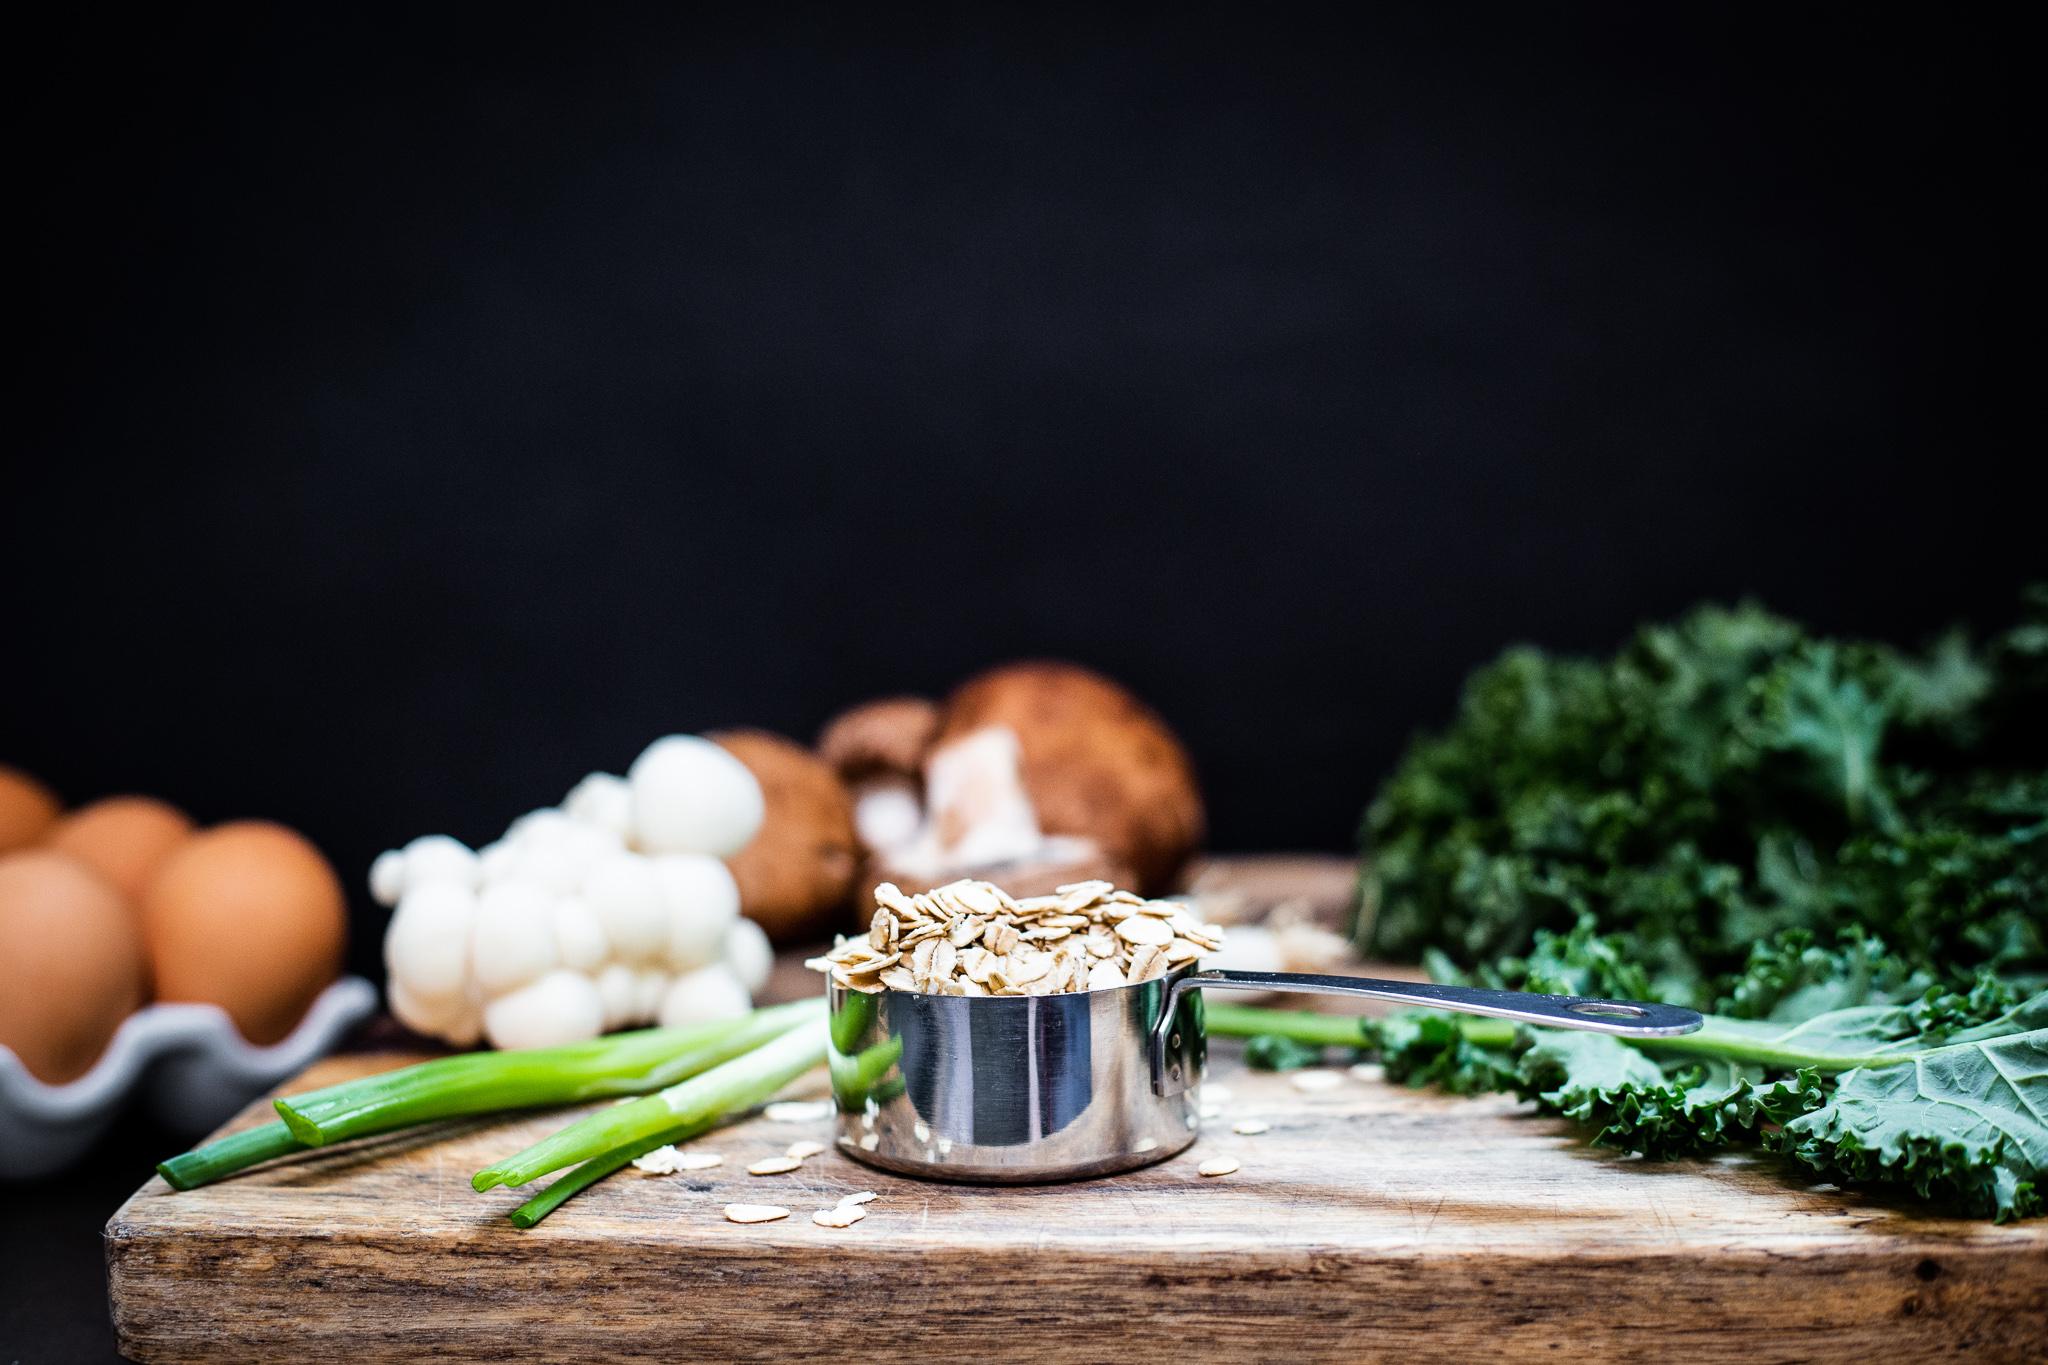 Oatmeal Bowl: Savory Oatmeal